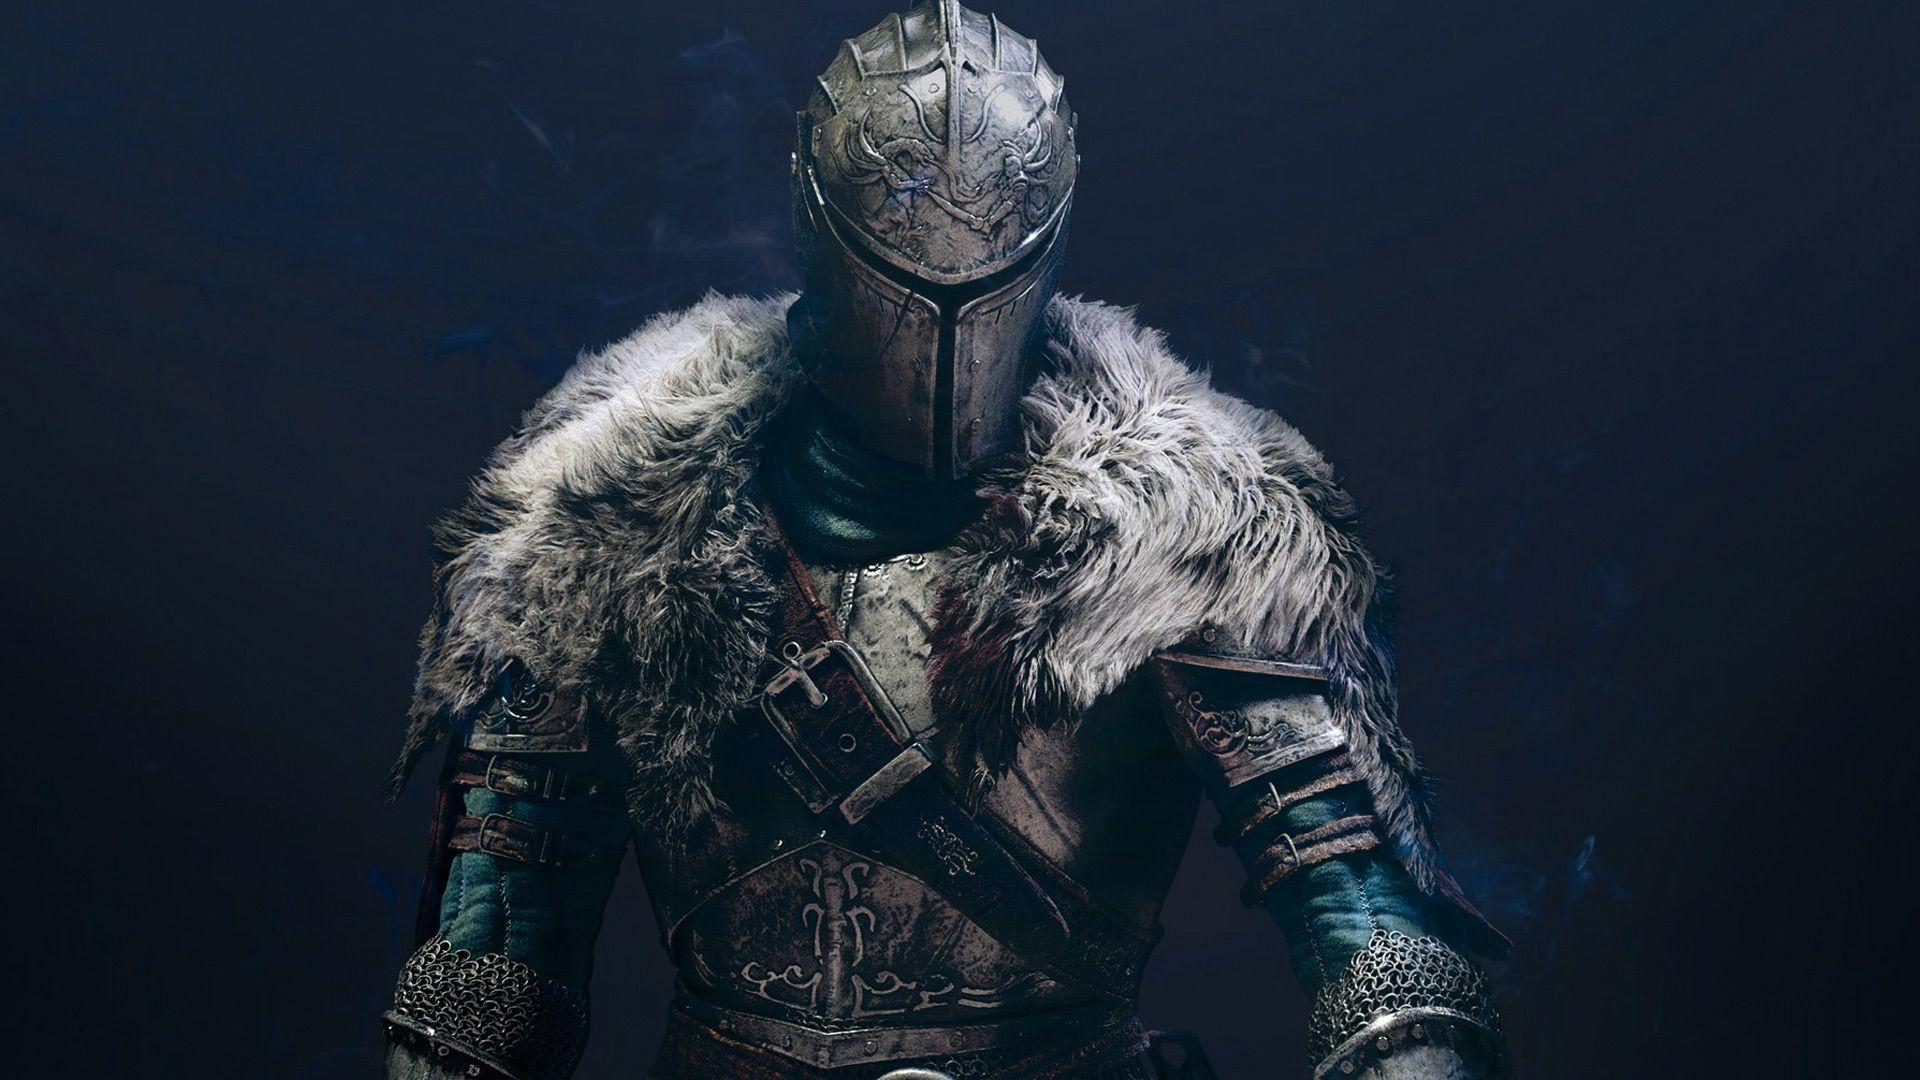 1920x1080 Dark Souls Knight Medieval Hd Dimensions Wallpaper Background